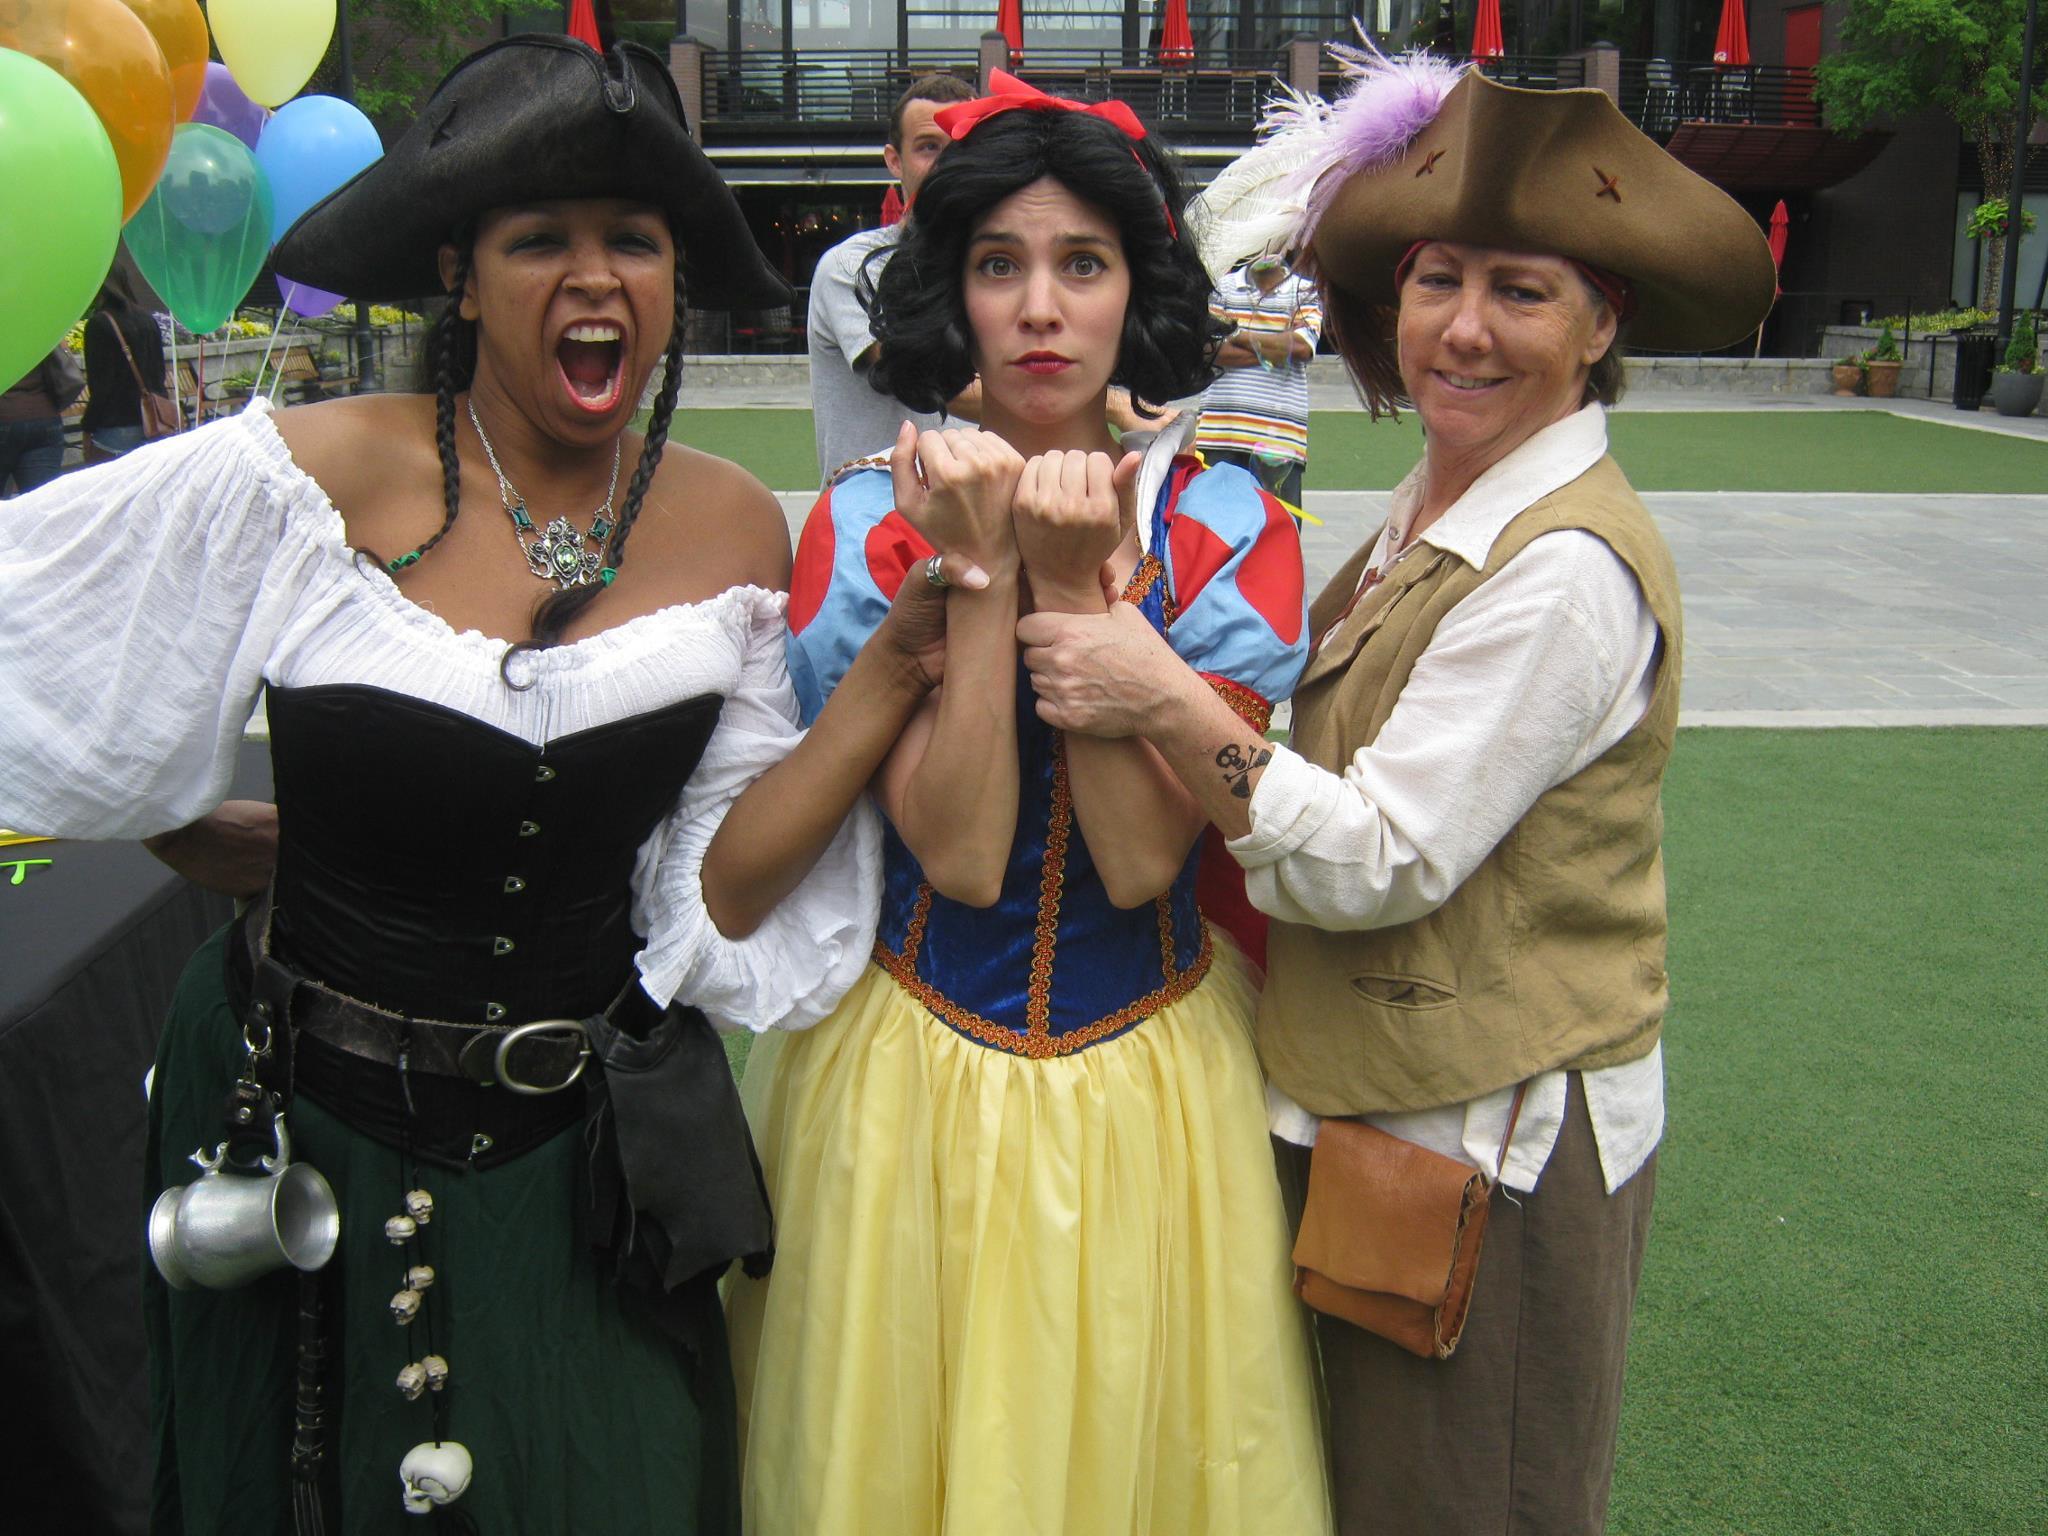 Female Pirate Party Atlanta